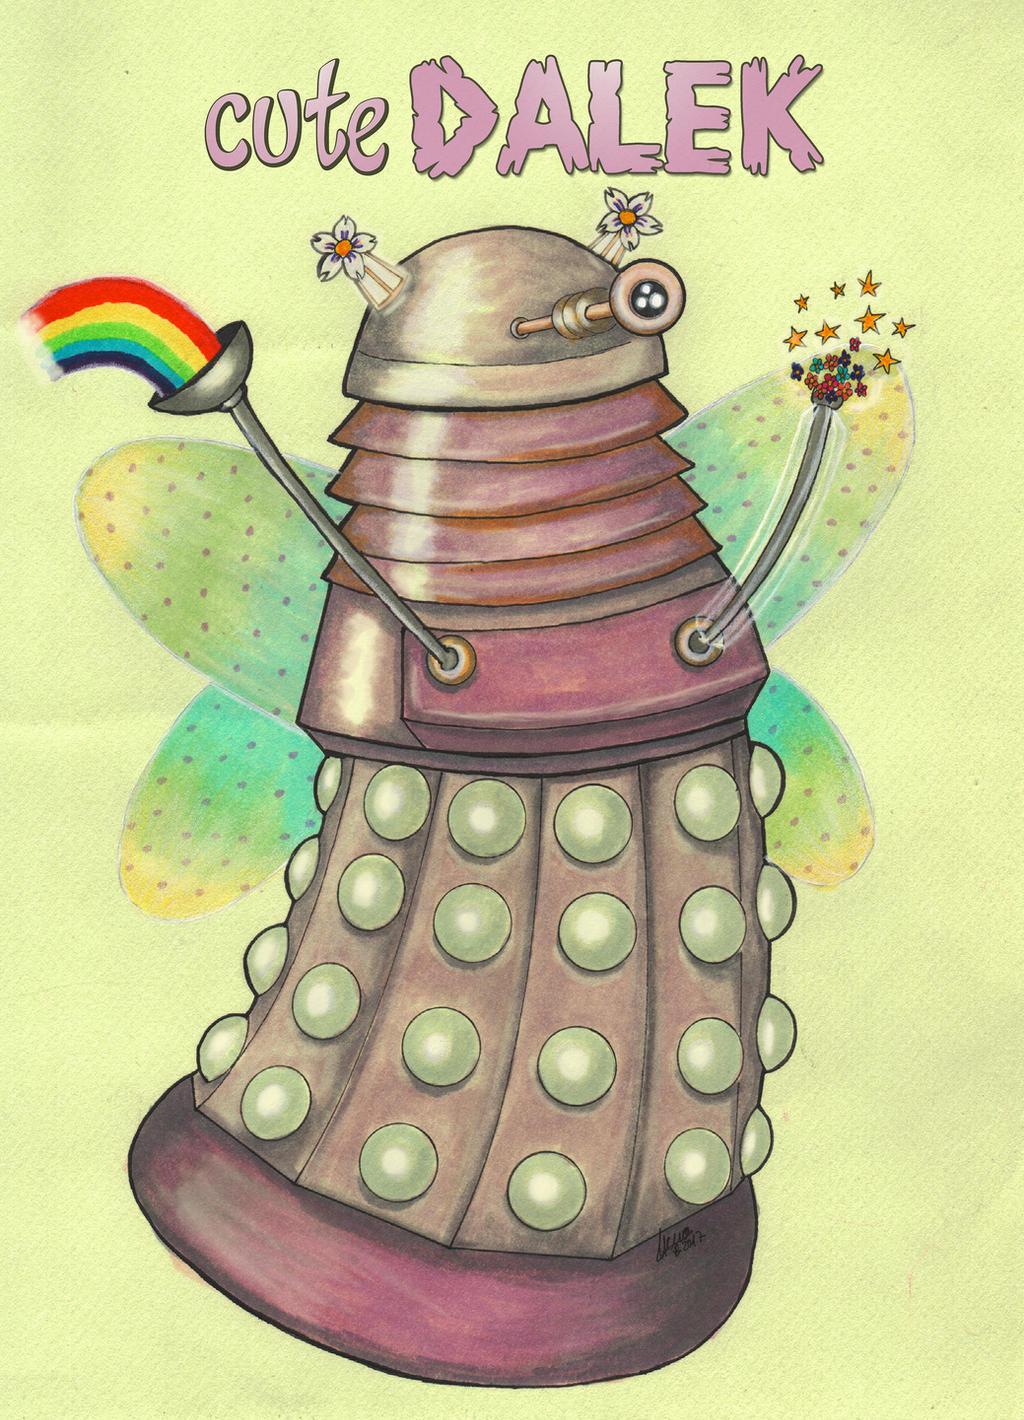 Cute Dalek by Quarantine1977